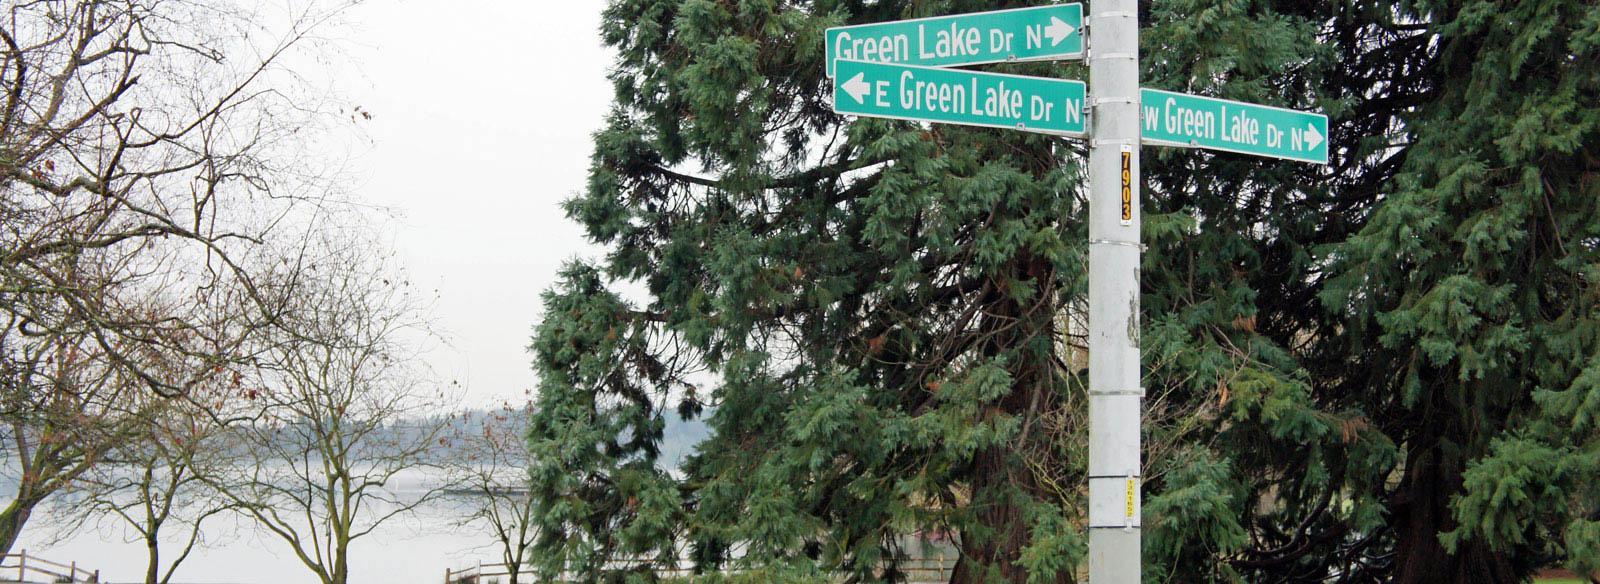 Green Lake Drive Street Sign